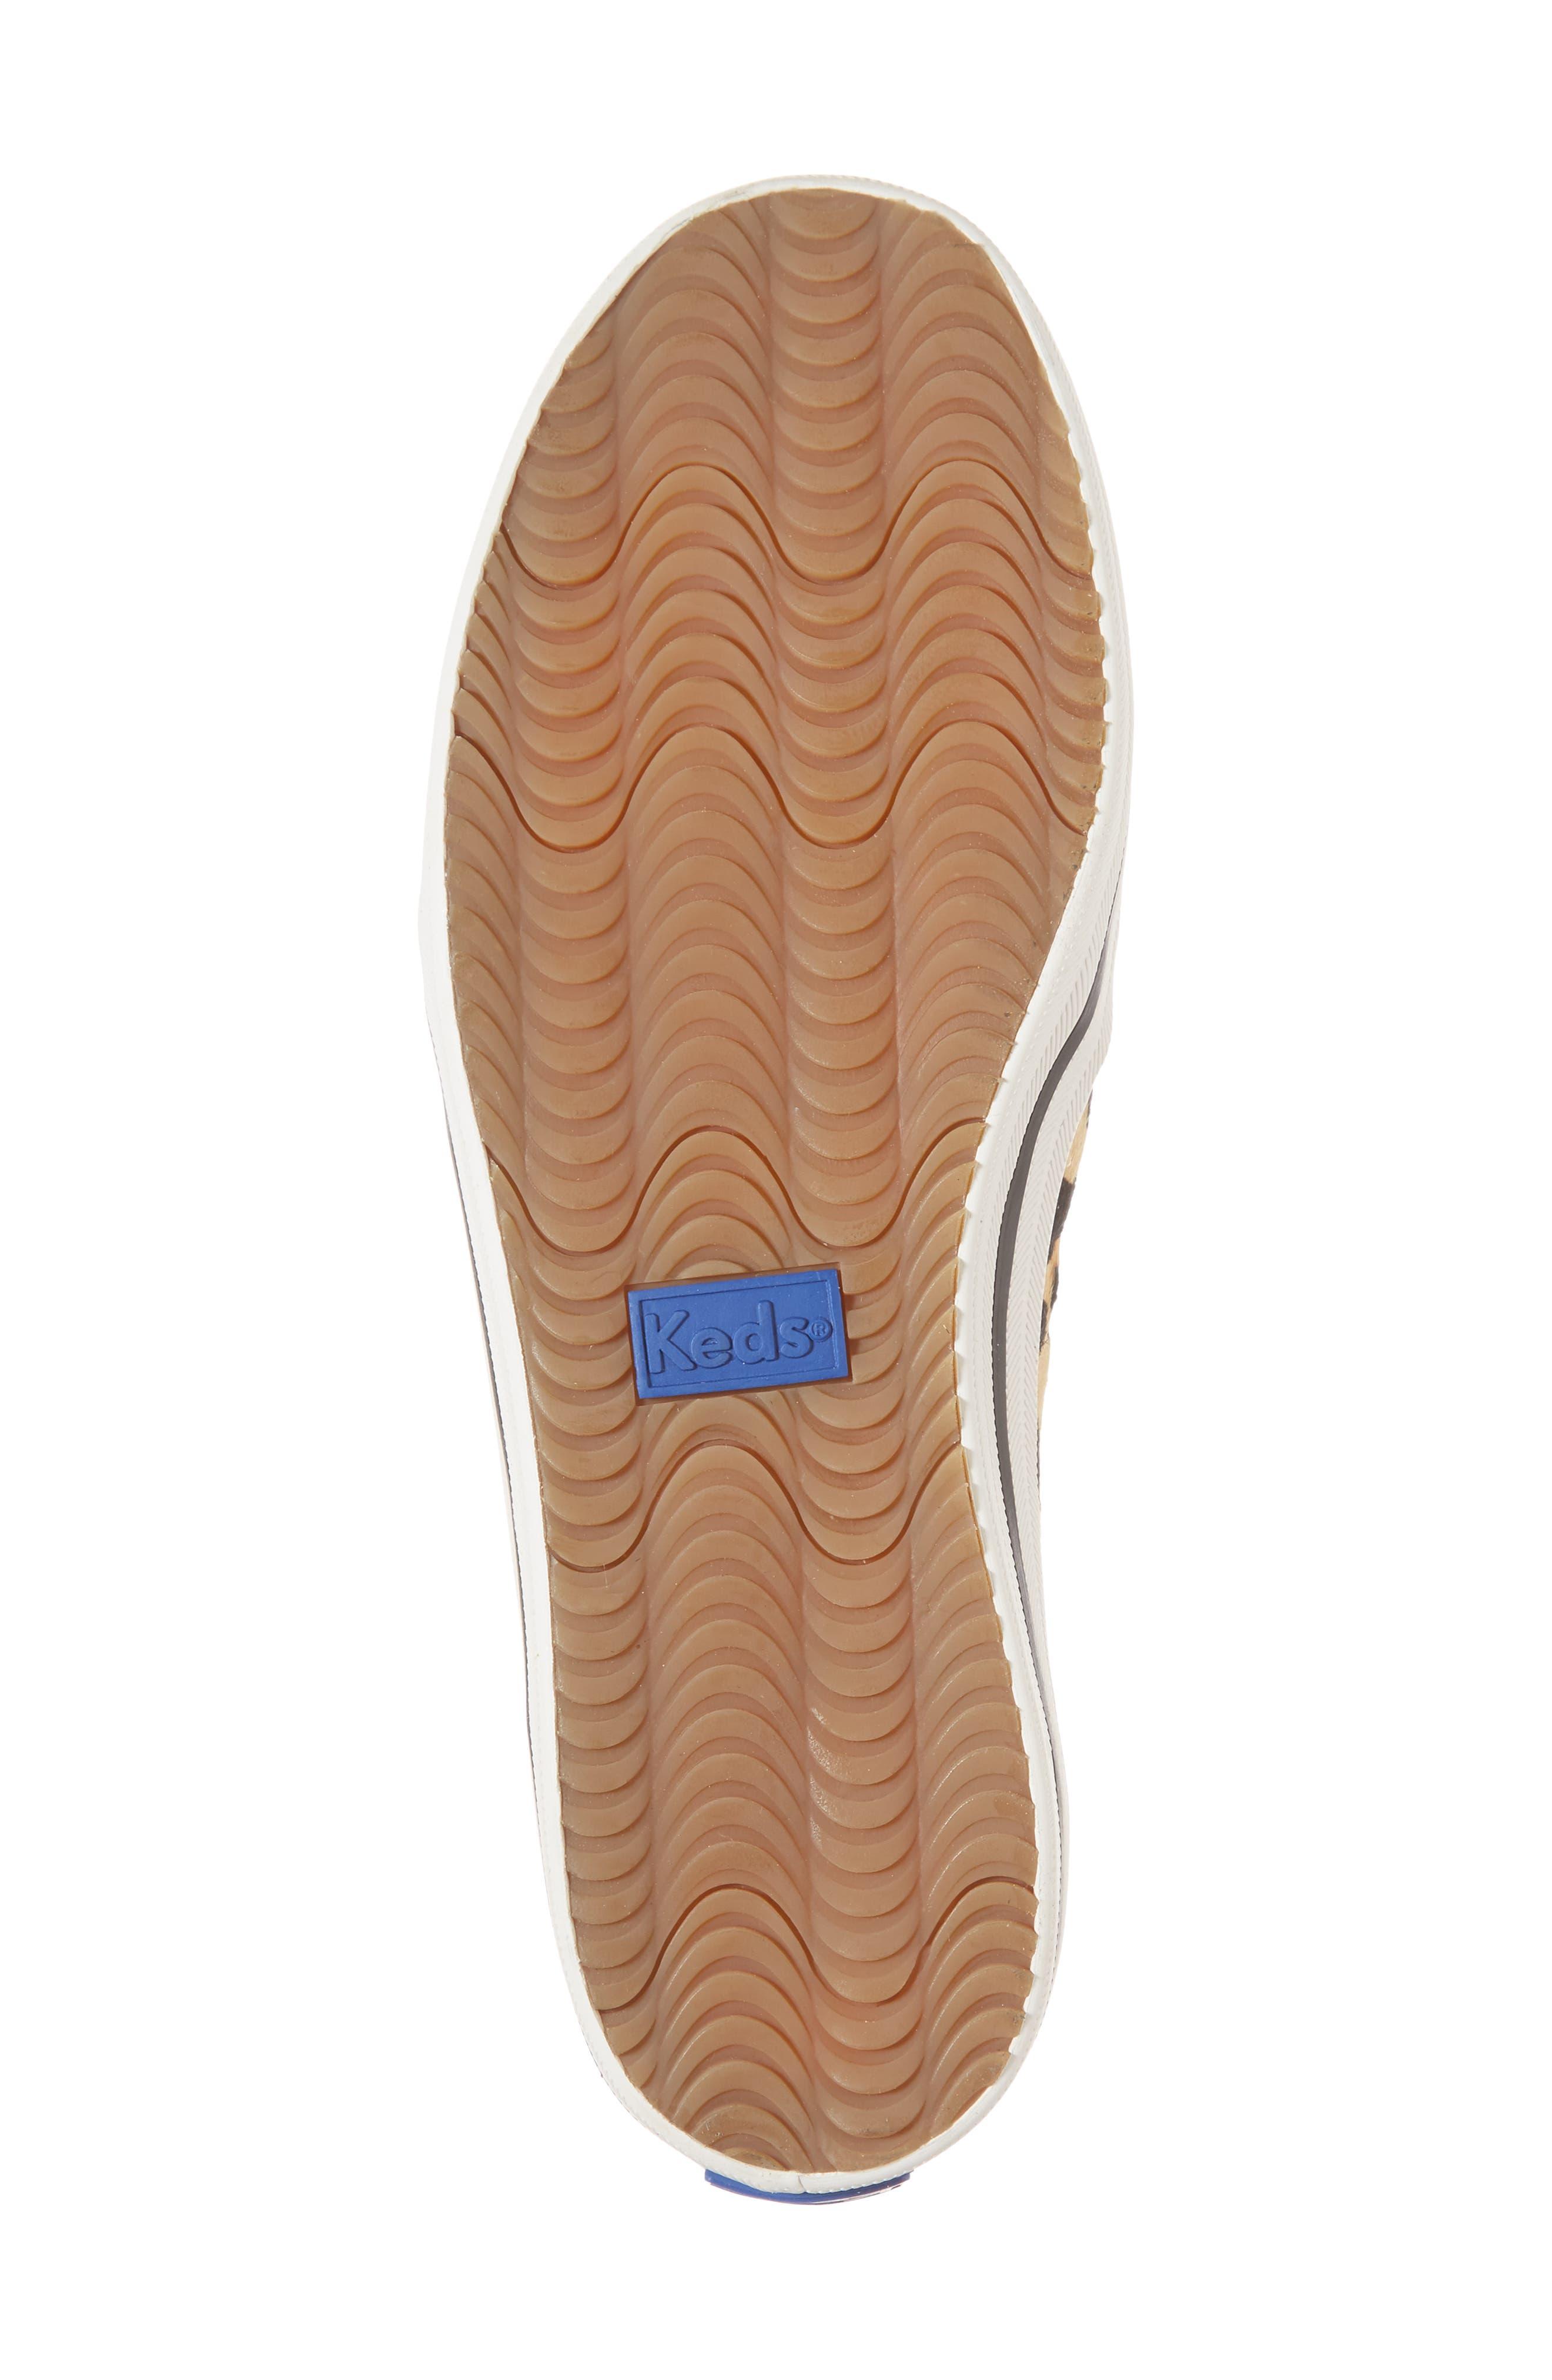 KEDS<SUP>®</SUP> FOR KATE SPADE NEW YORK, Keds<sup>®</sup> x kate spade Double Decker Slip-On Sneaker, Alternate thumbnail 6, color, TAN PONY HAIR